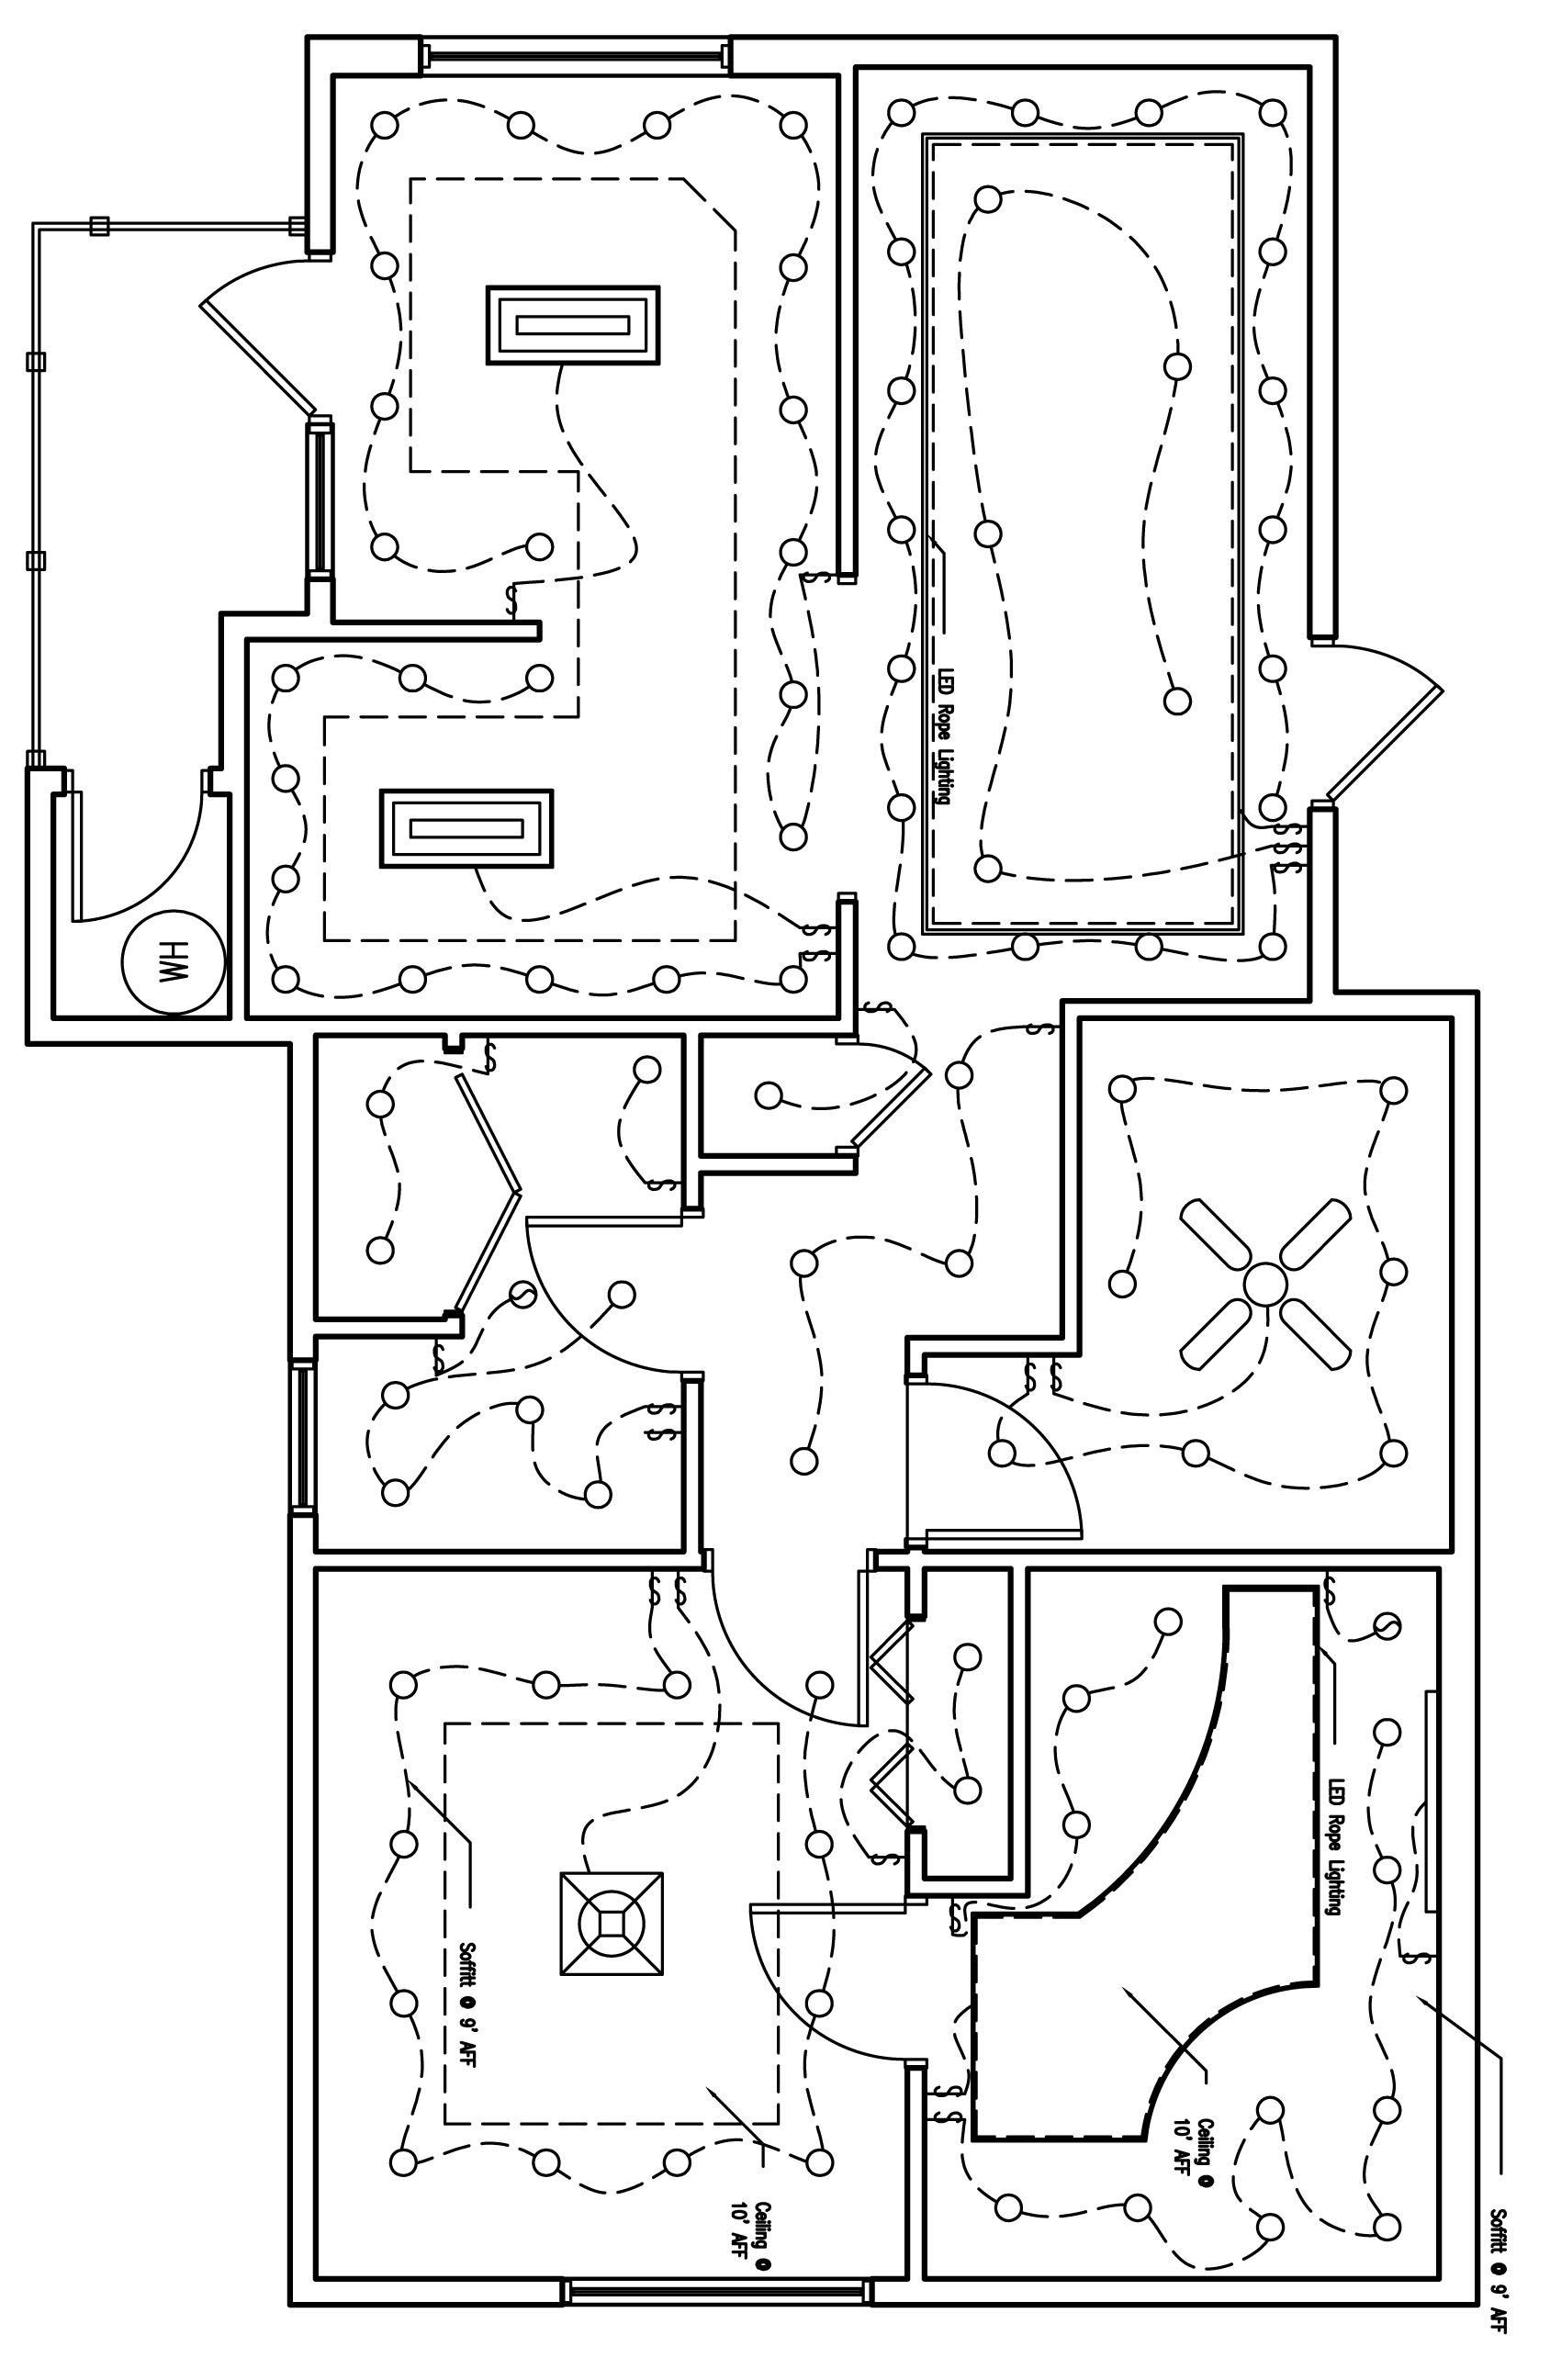 new electrical wiring design diagram wiringdiagram diagramming diagramm visuals visualisation graphical [ 1688 x 2592 Pixel ]